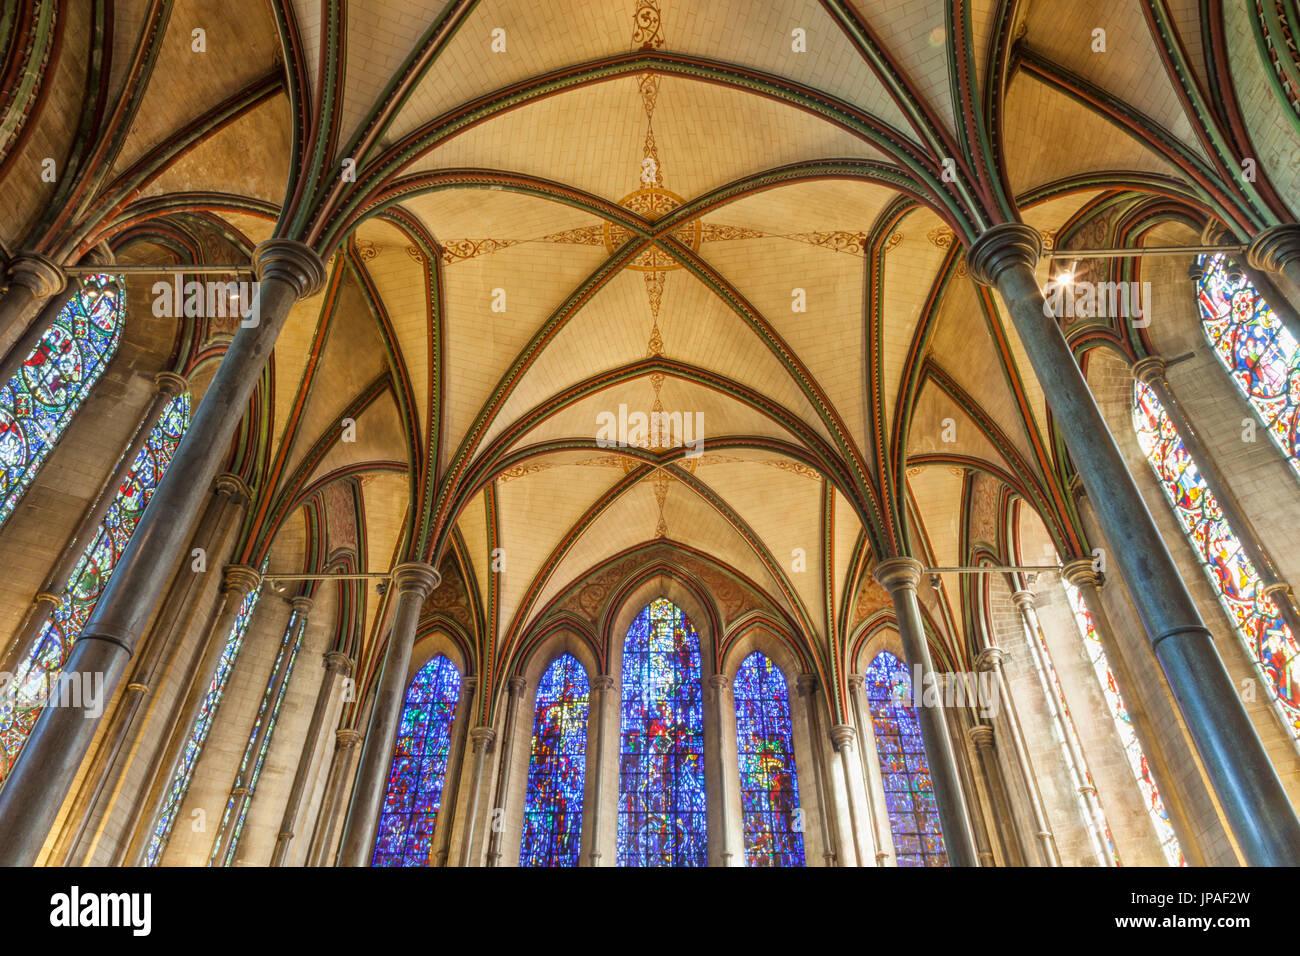 England, Wiltshire, Salisbury, Salisbury Cathedral, The Prisoners of Conscience Window - Stock Image